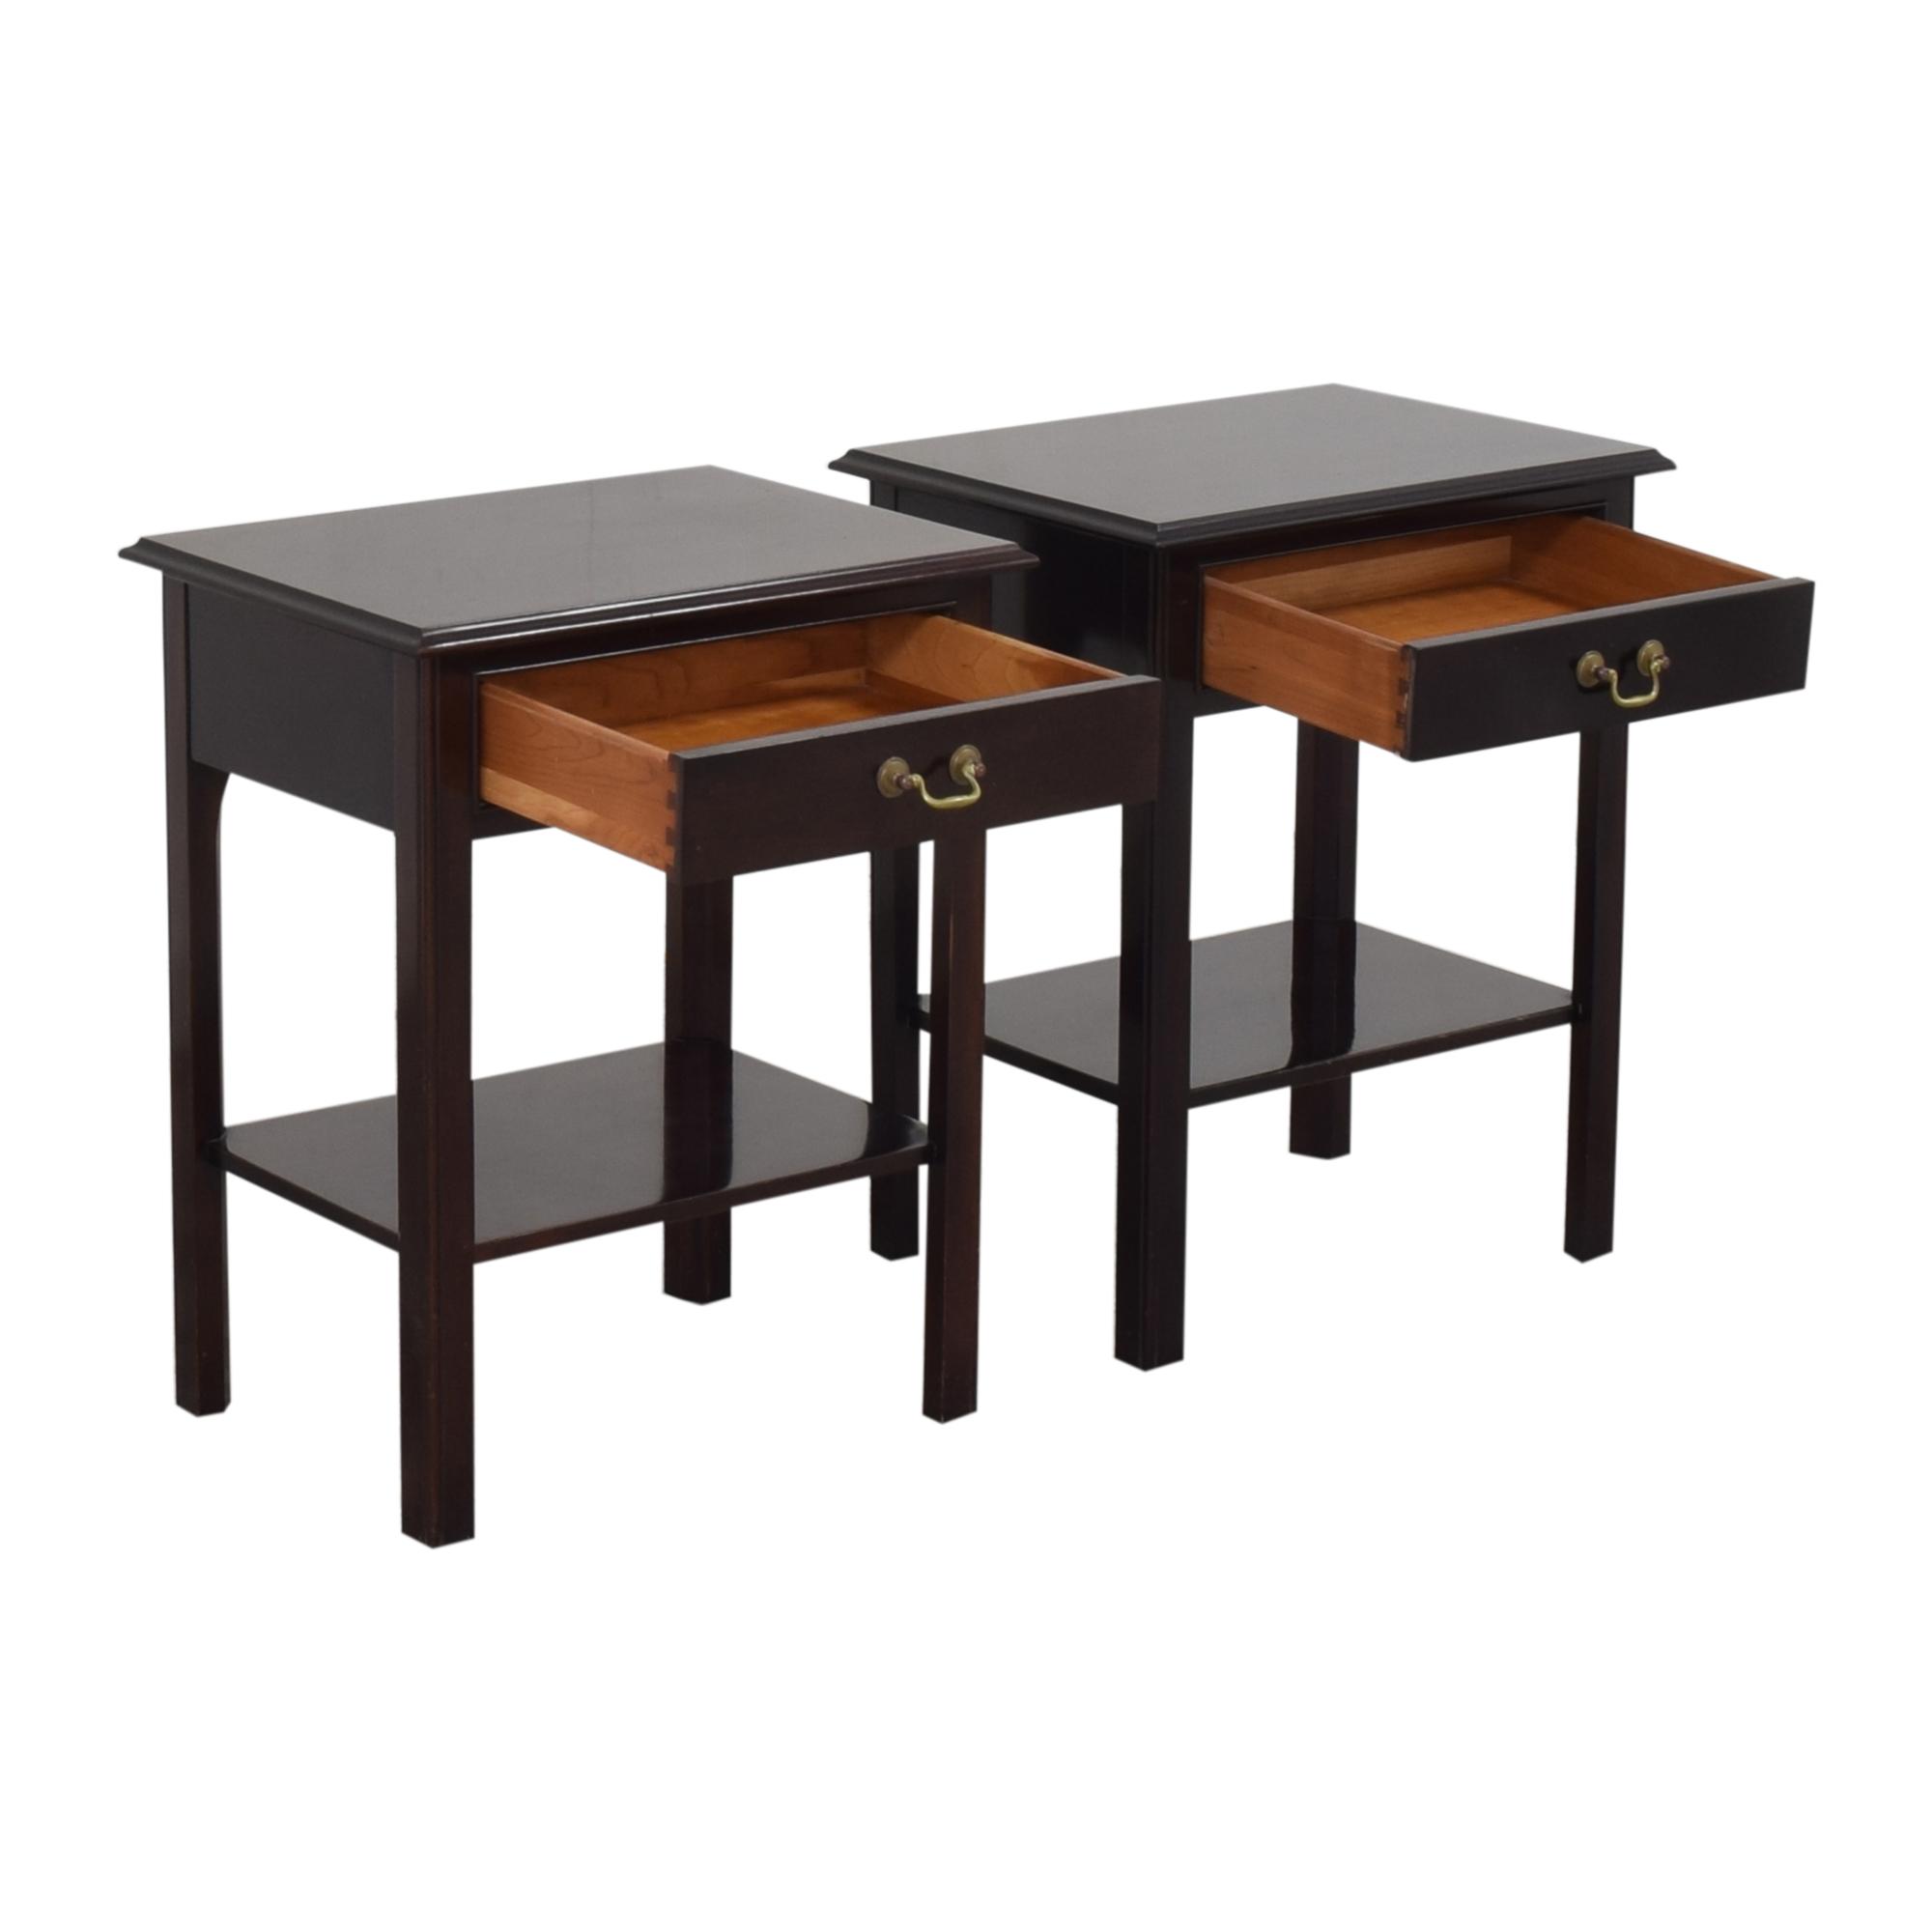 Stickley Furniture Stickley Furniture Nightstands Tables